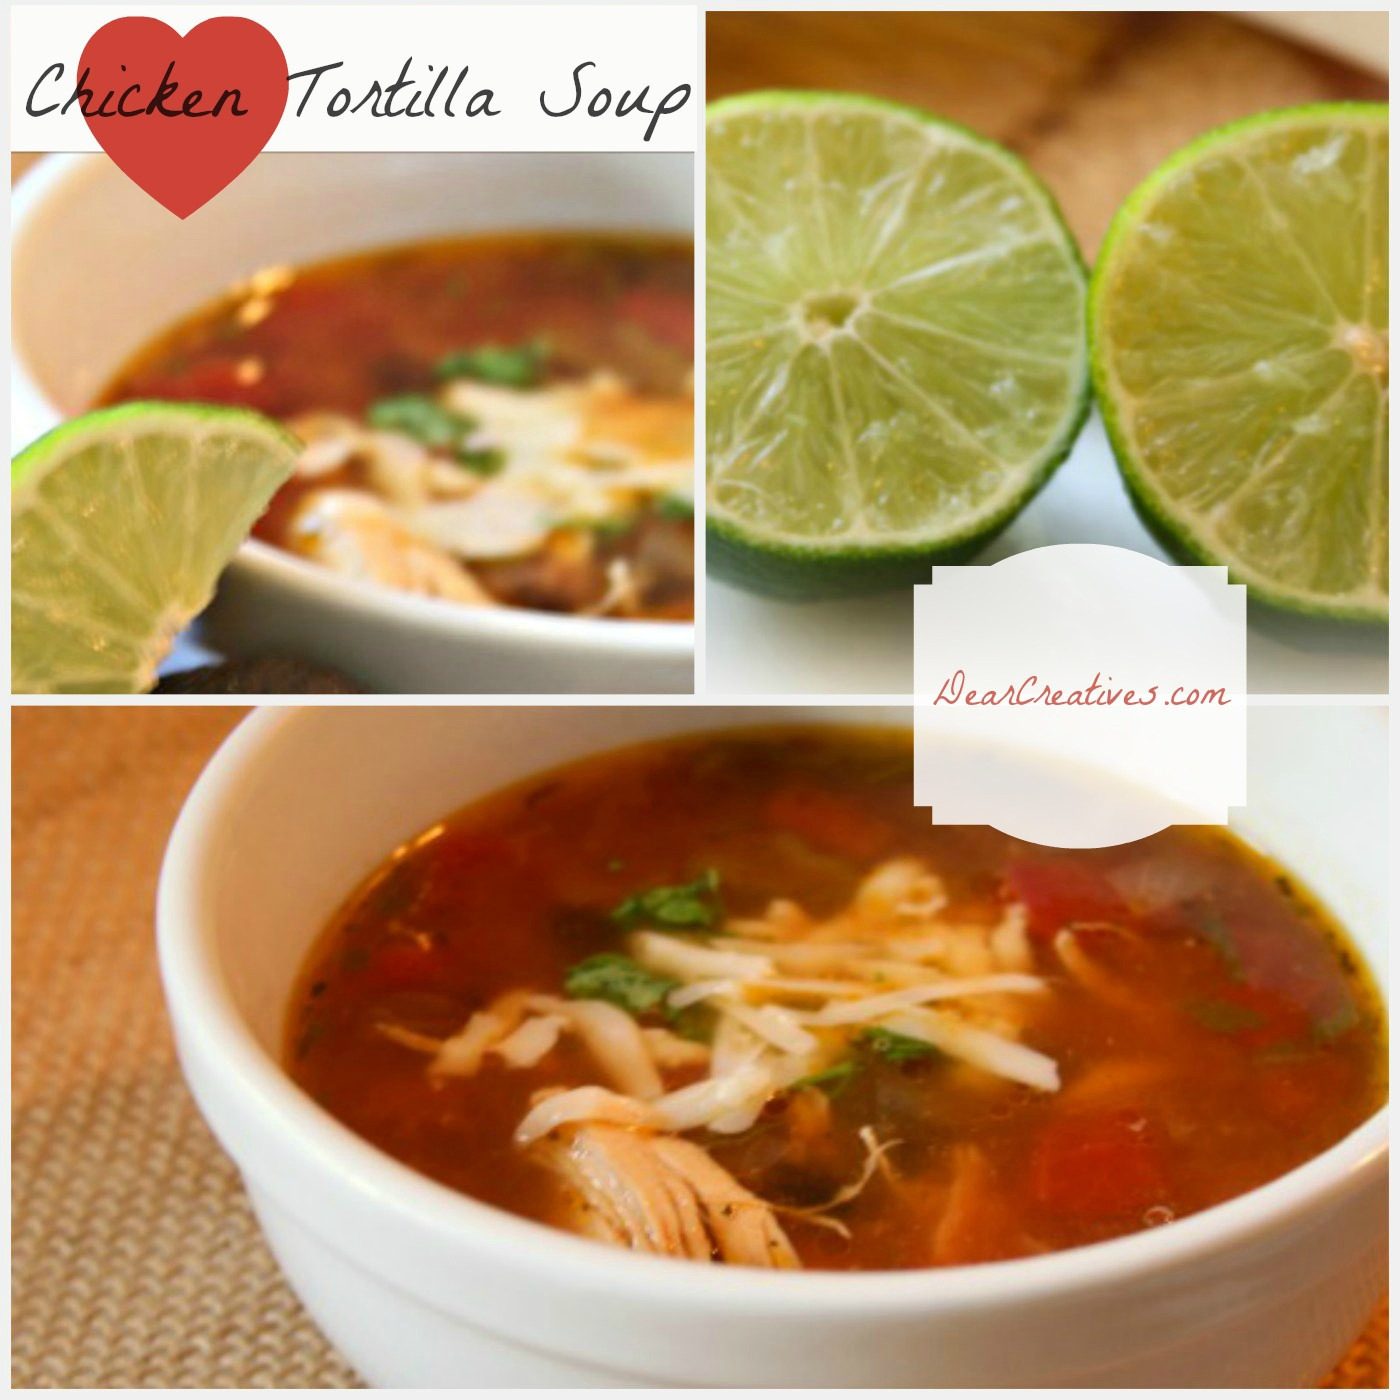 Easy Chicken Tortilla Soup Recipe  Our Favorite Chicken Tortilla Soup Recipe Dear Creatives